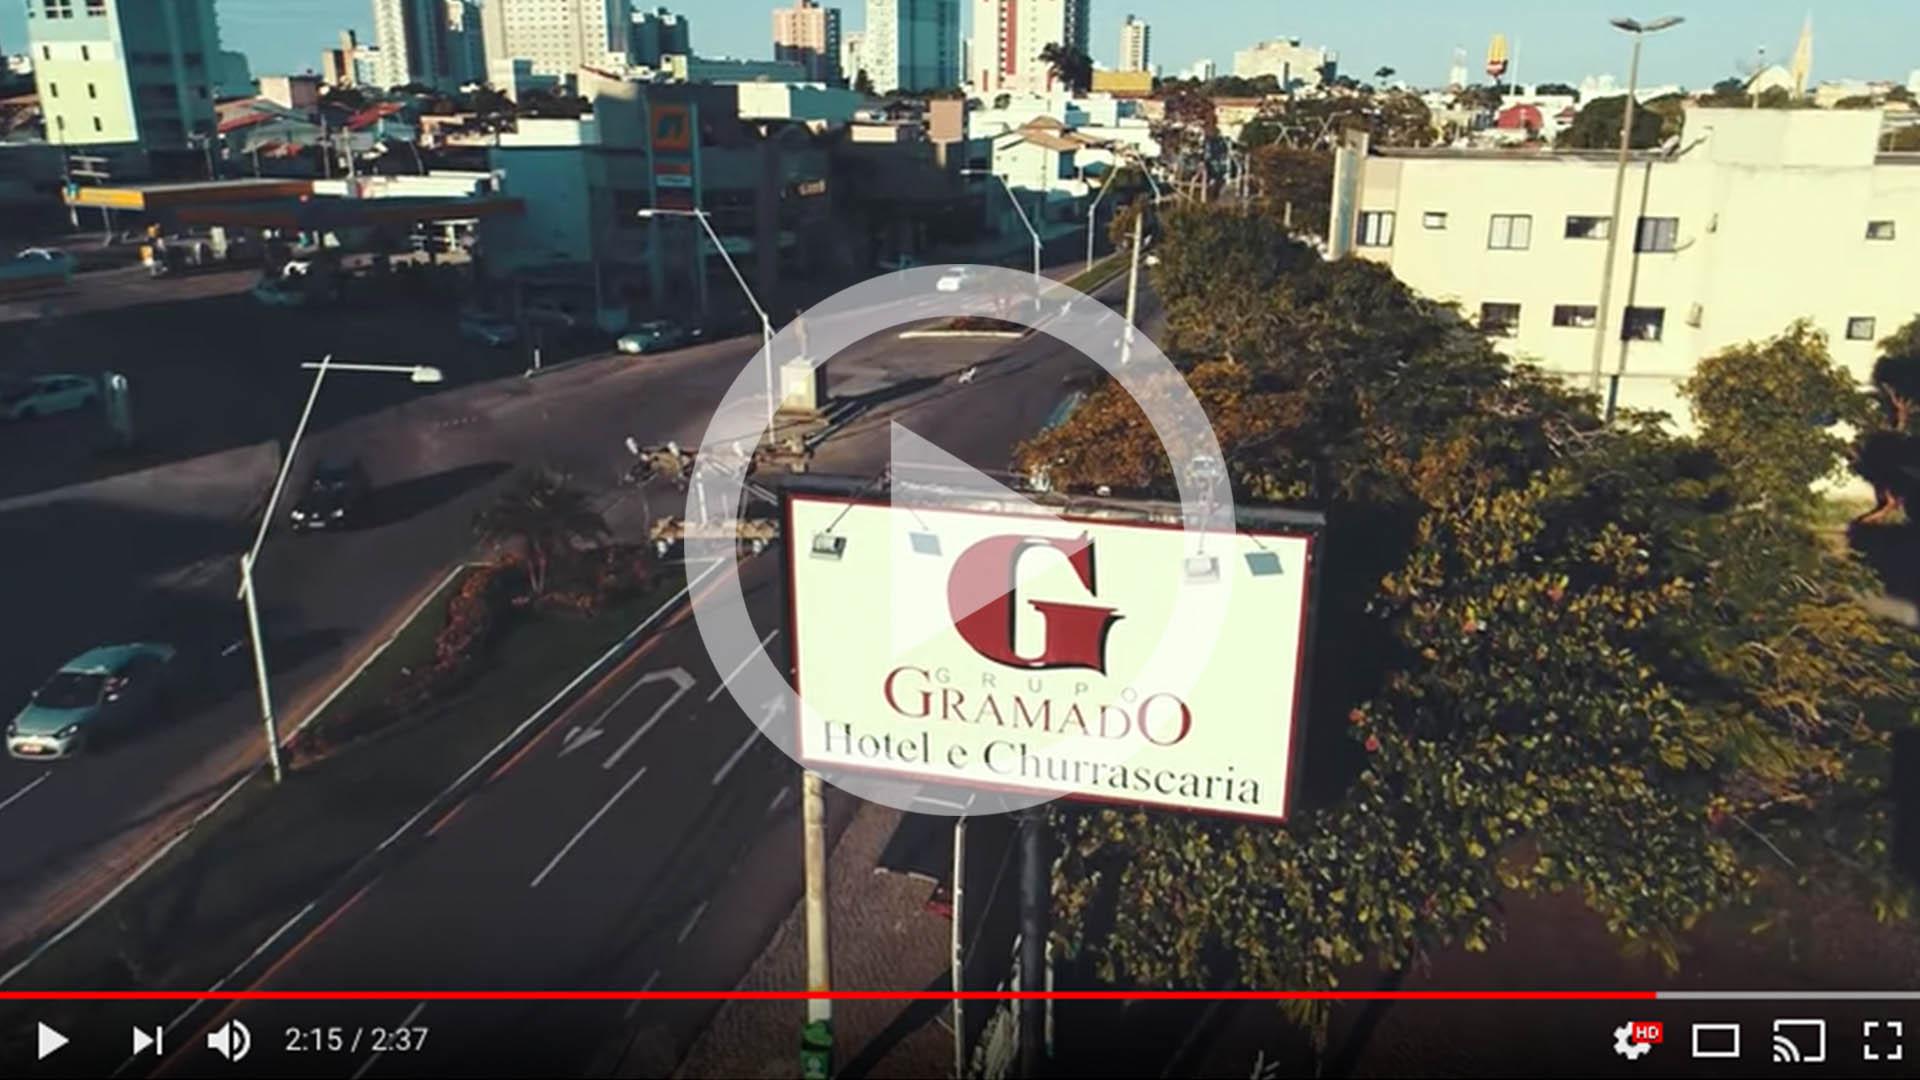 Hotel Grupo Gramado